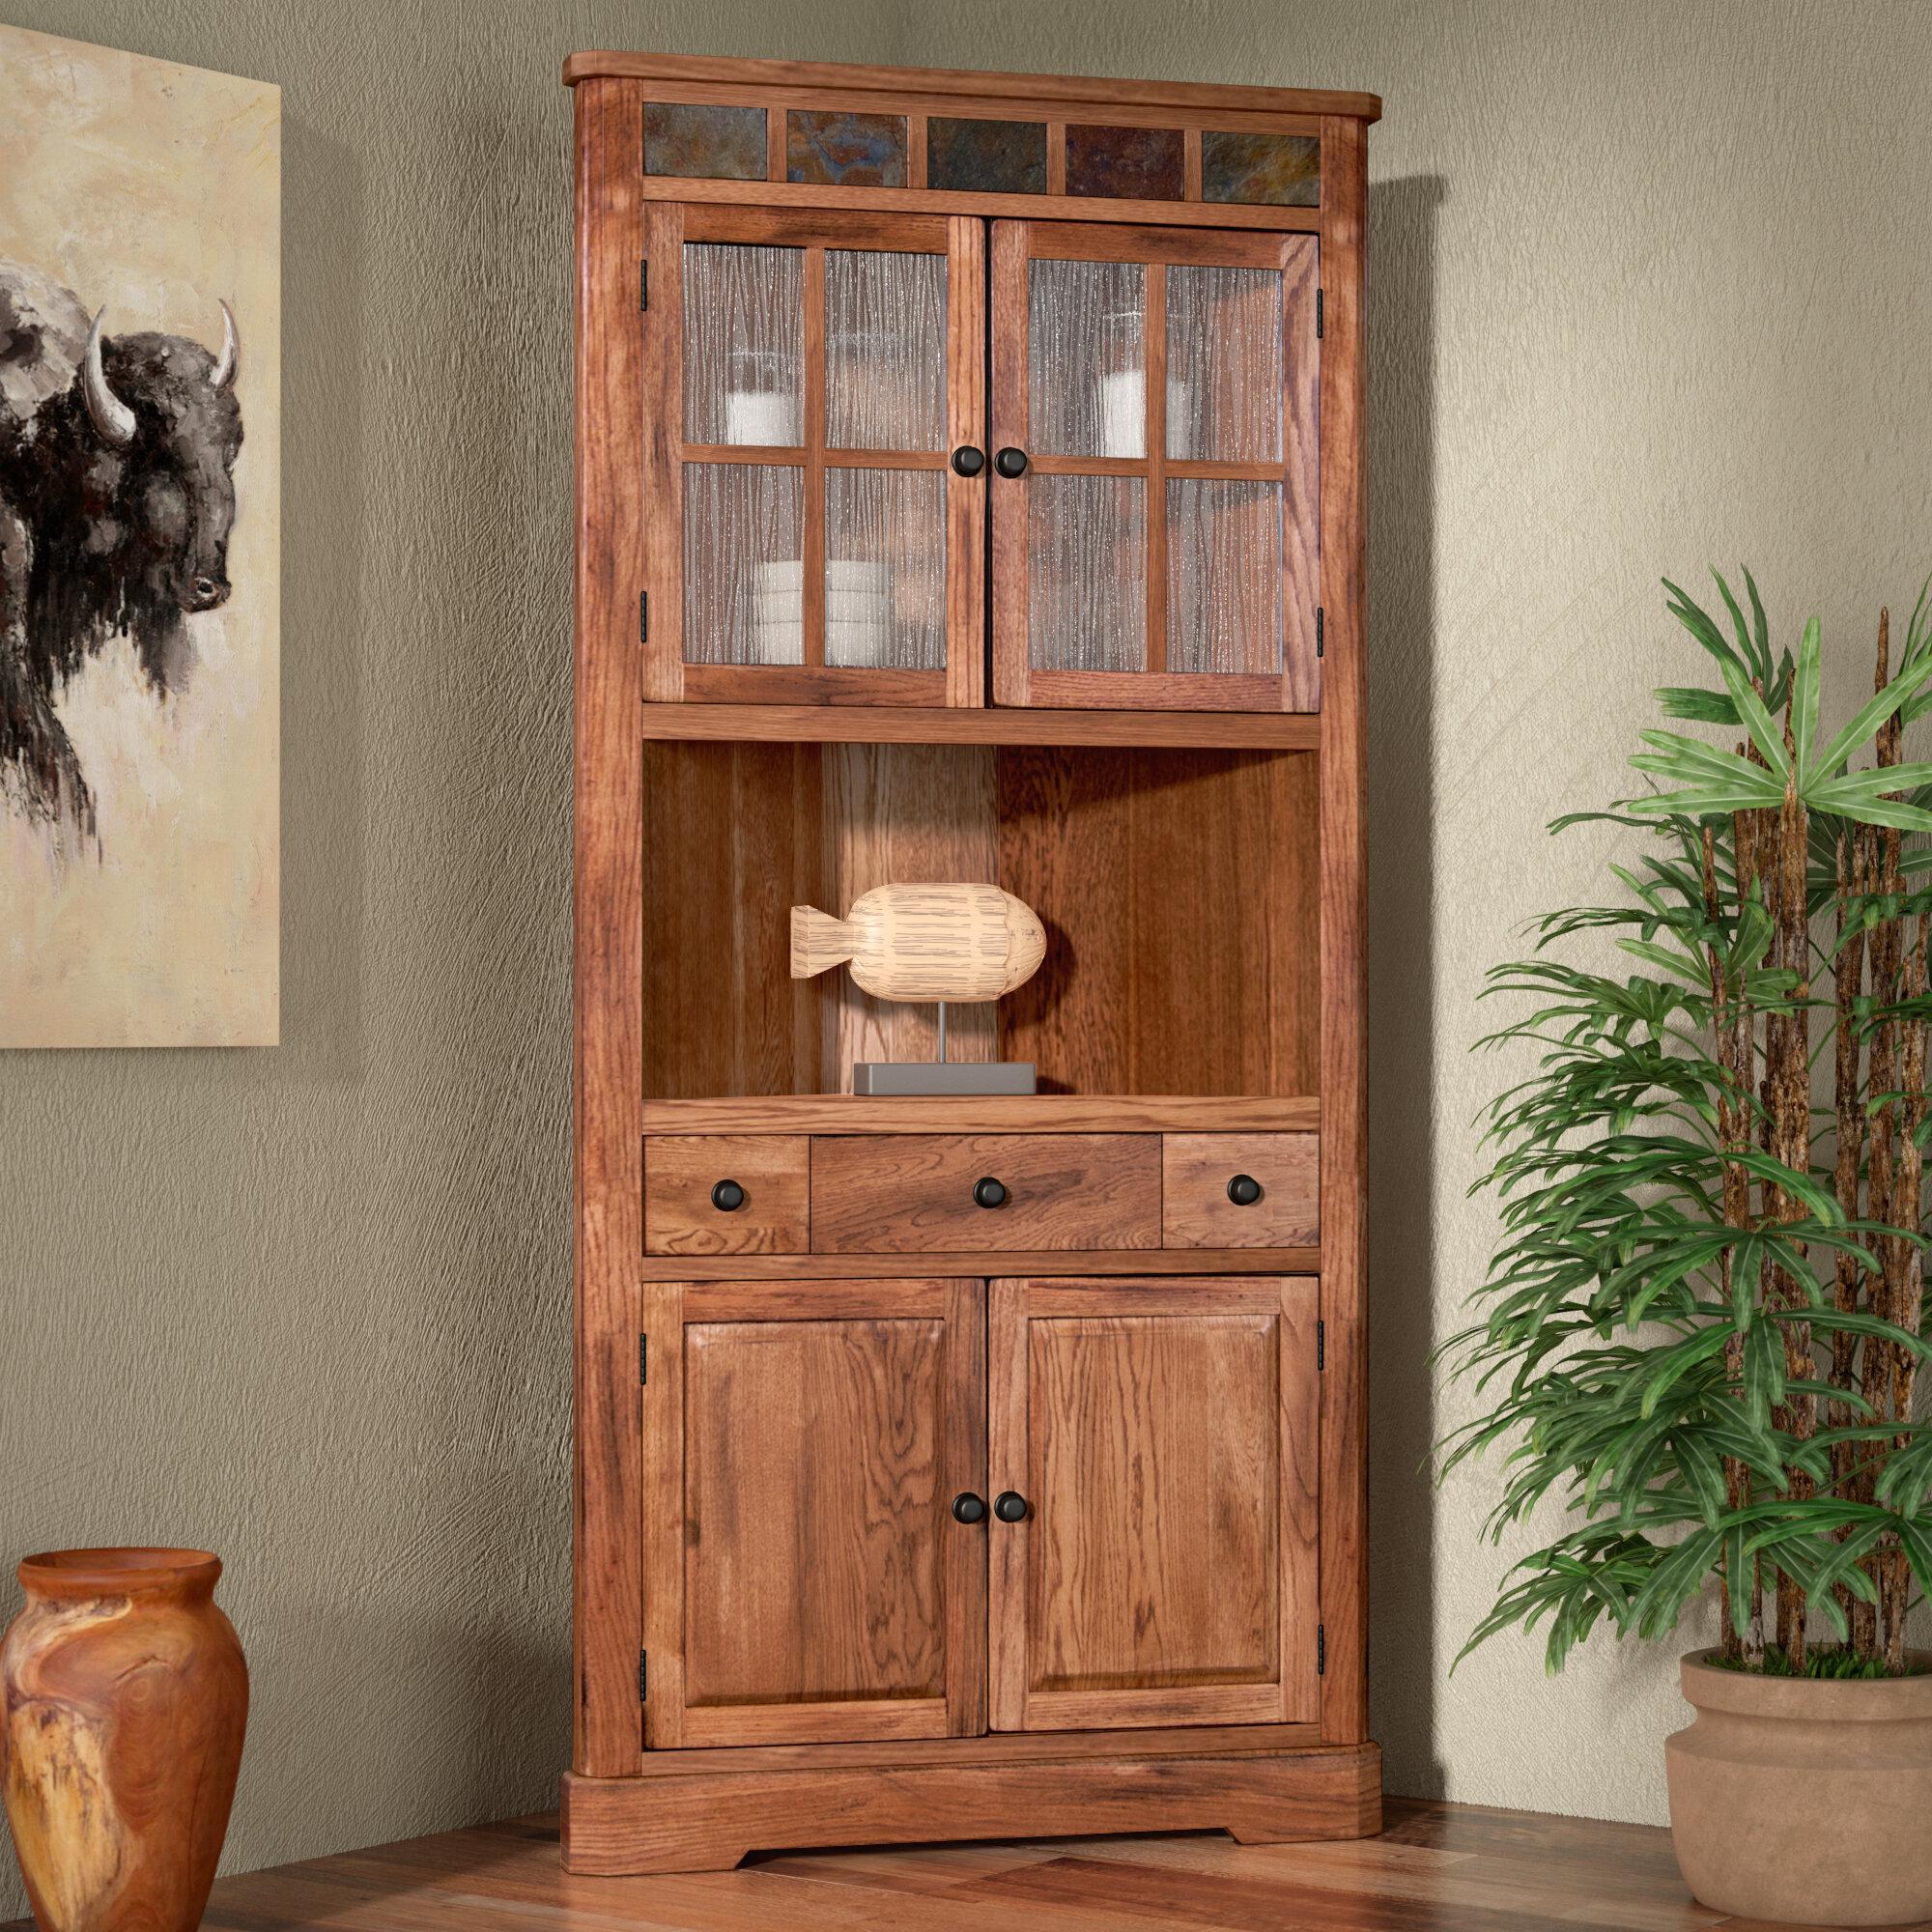 fresno peak and pdx cabinet multimedia furniture loon shelving rack